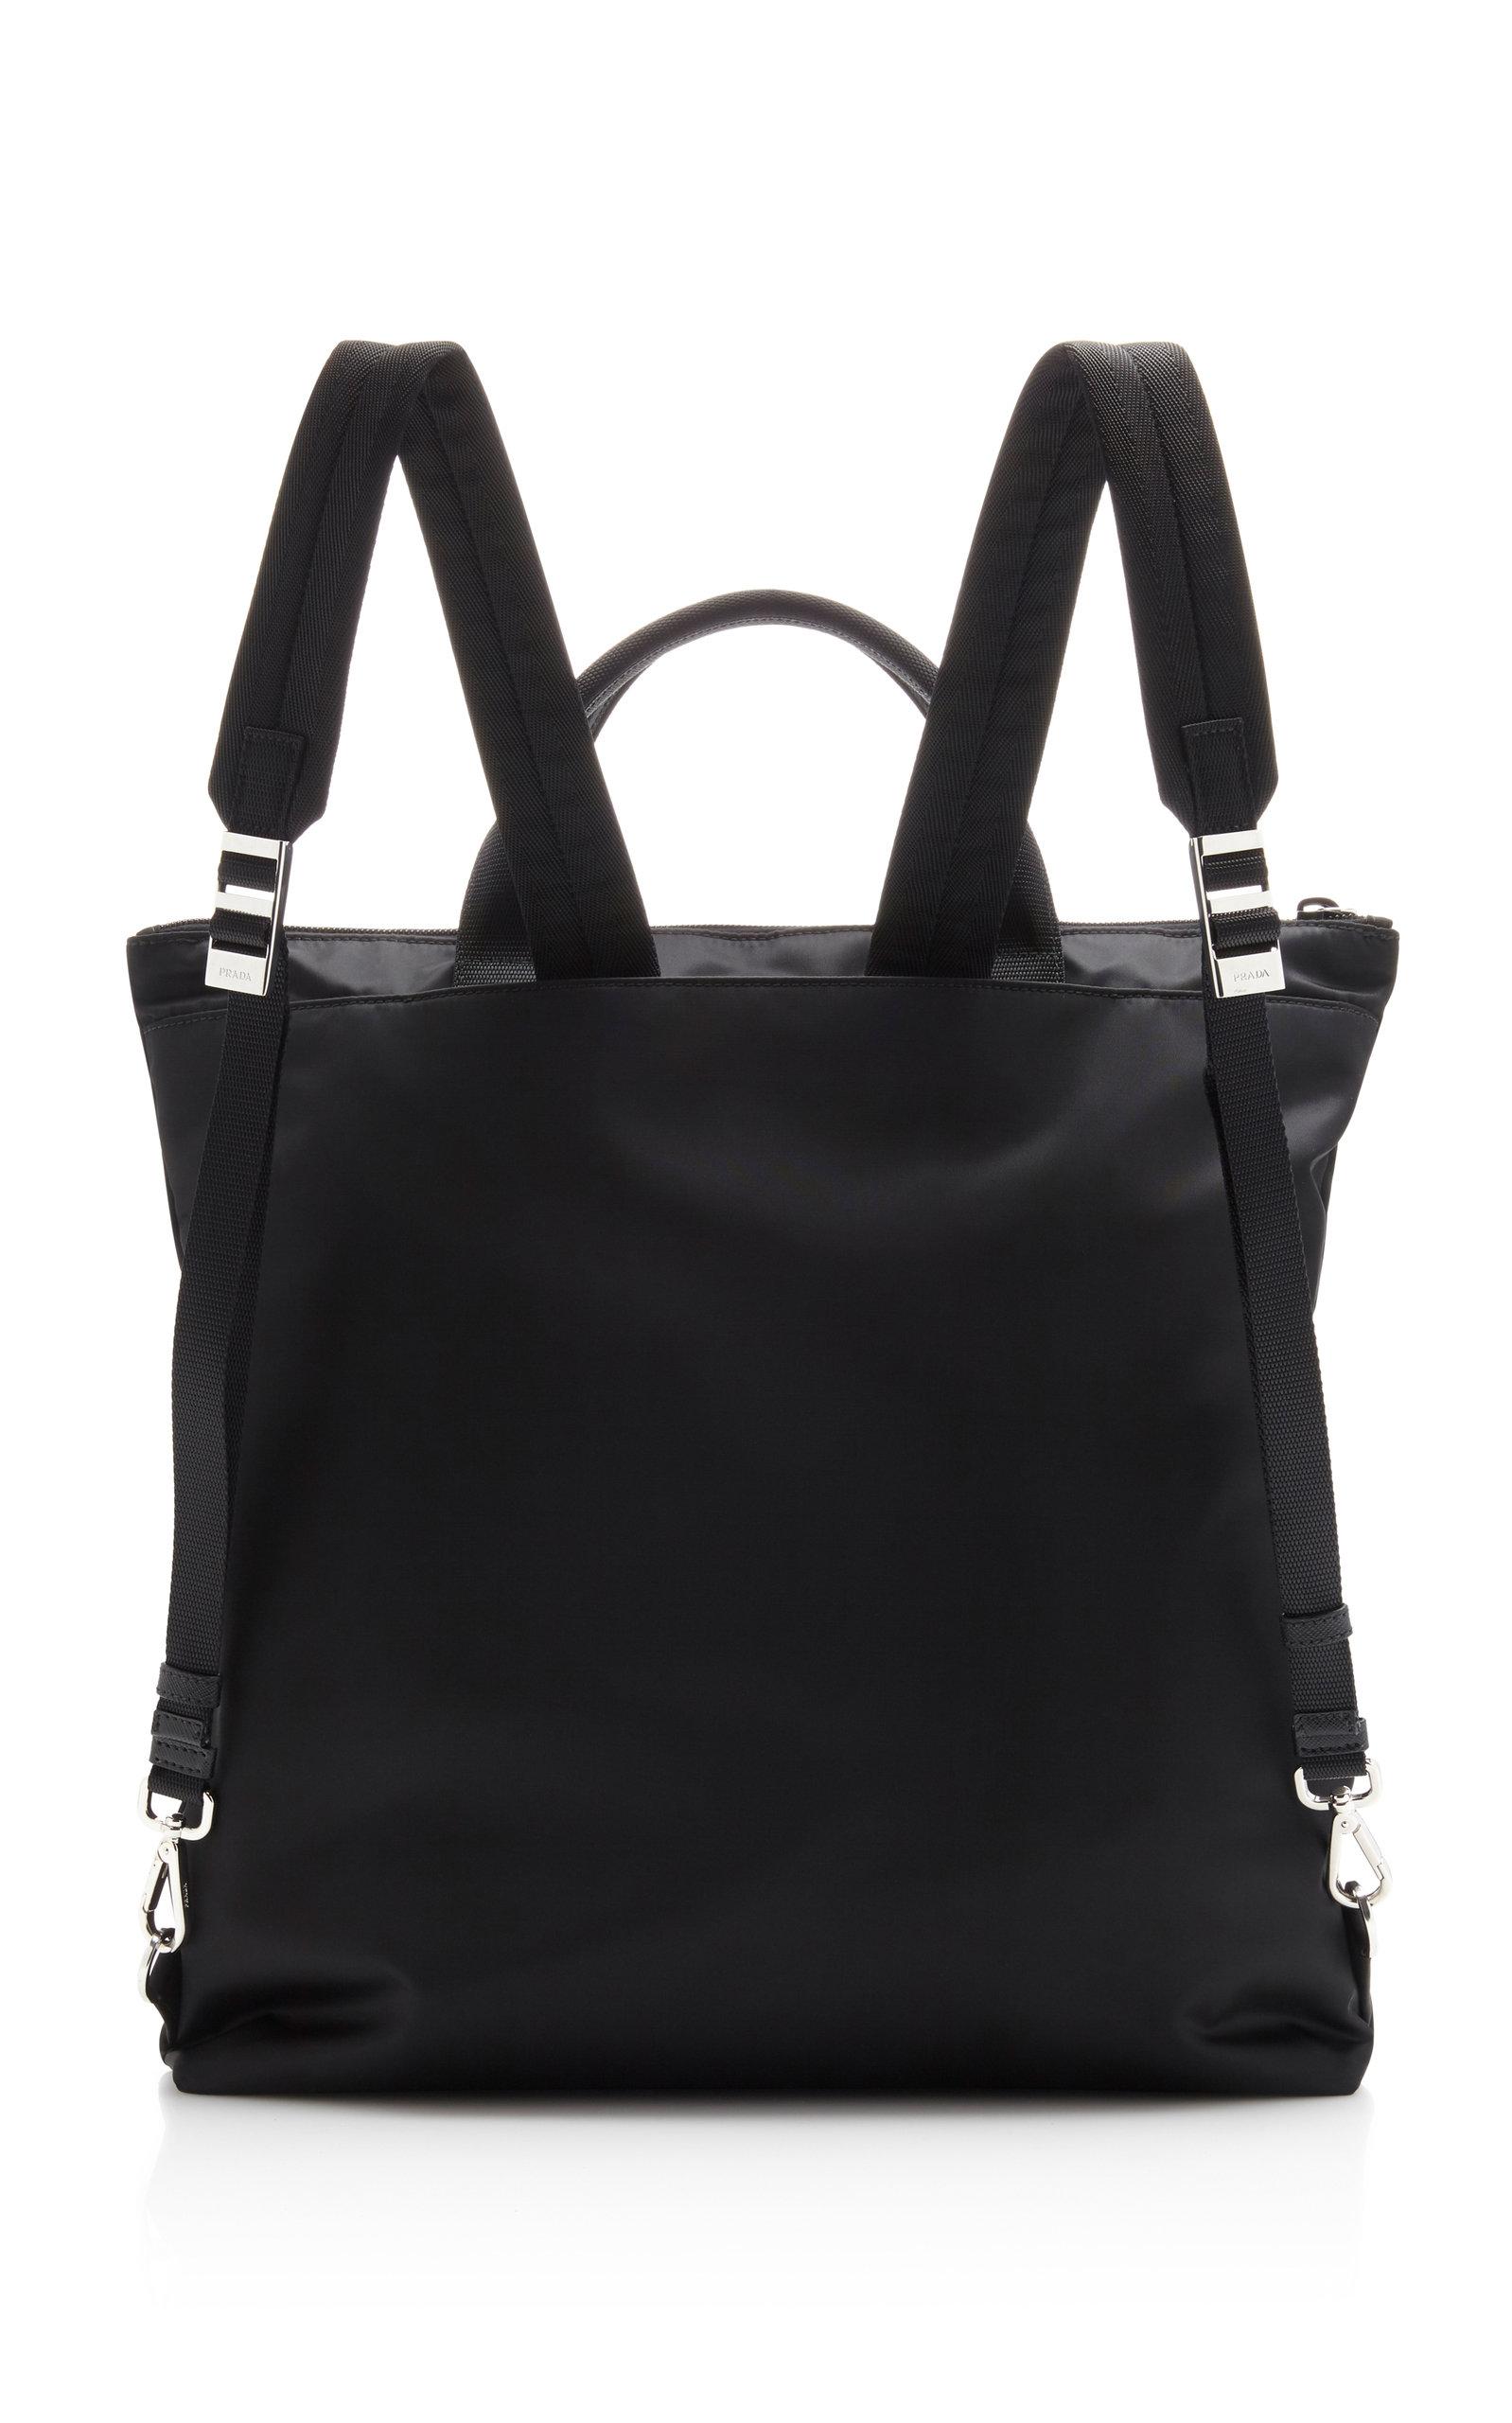 725c4673396525 PradaConvertible Nylon Tote Bag. CLOSE. Loading. Loading